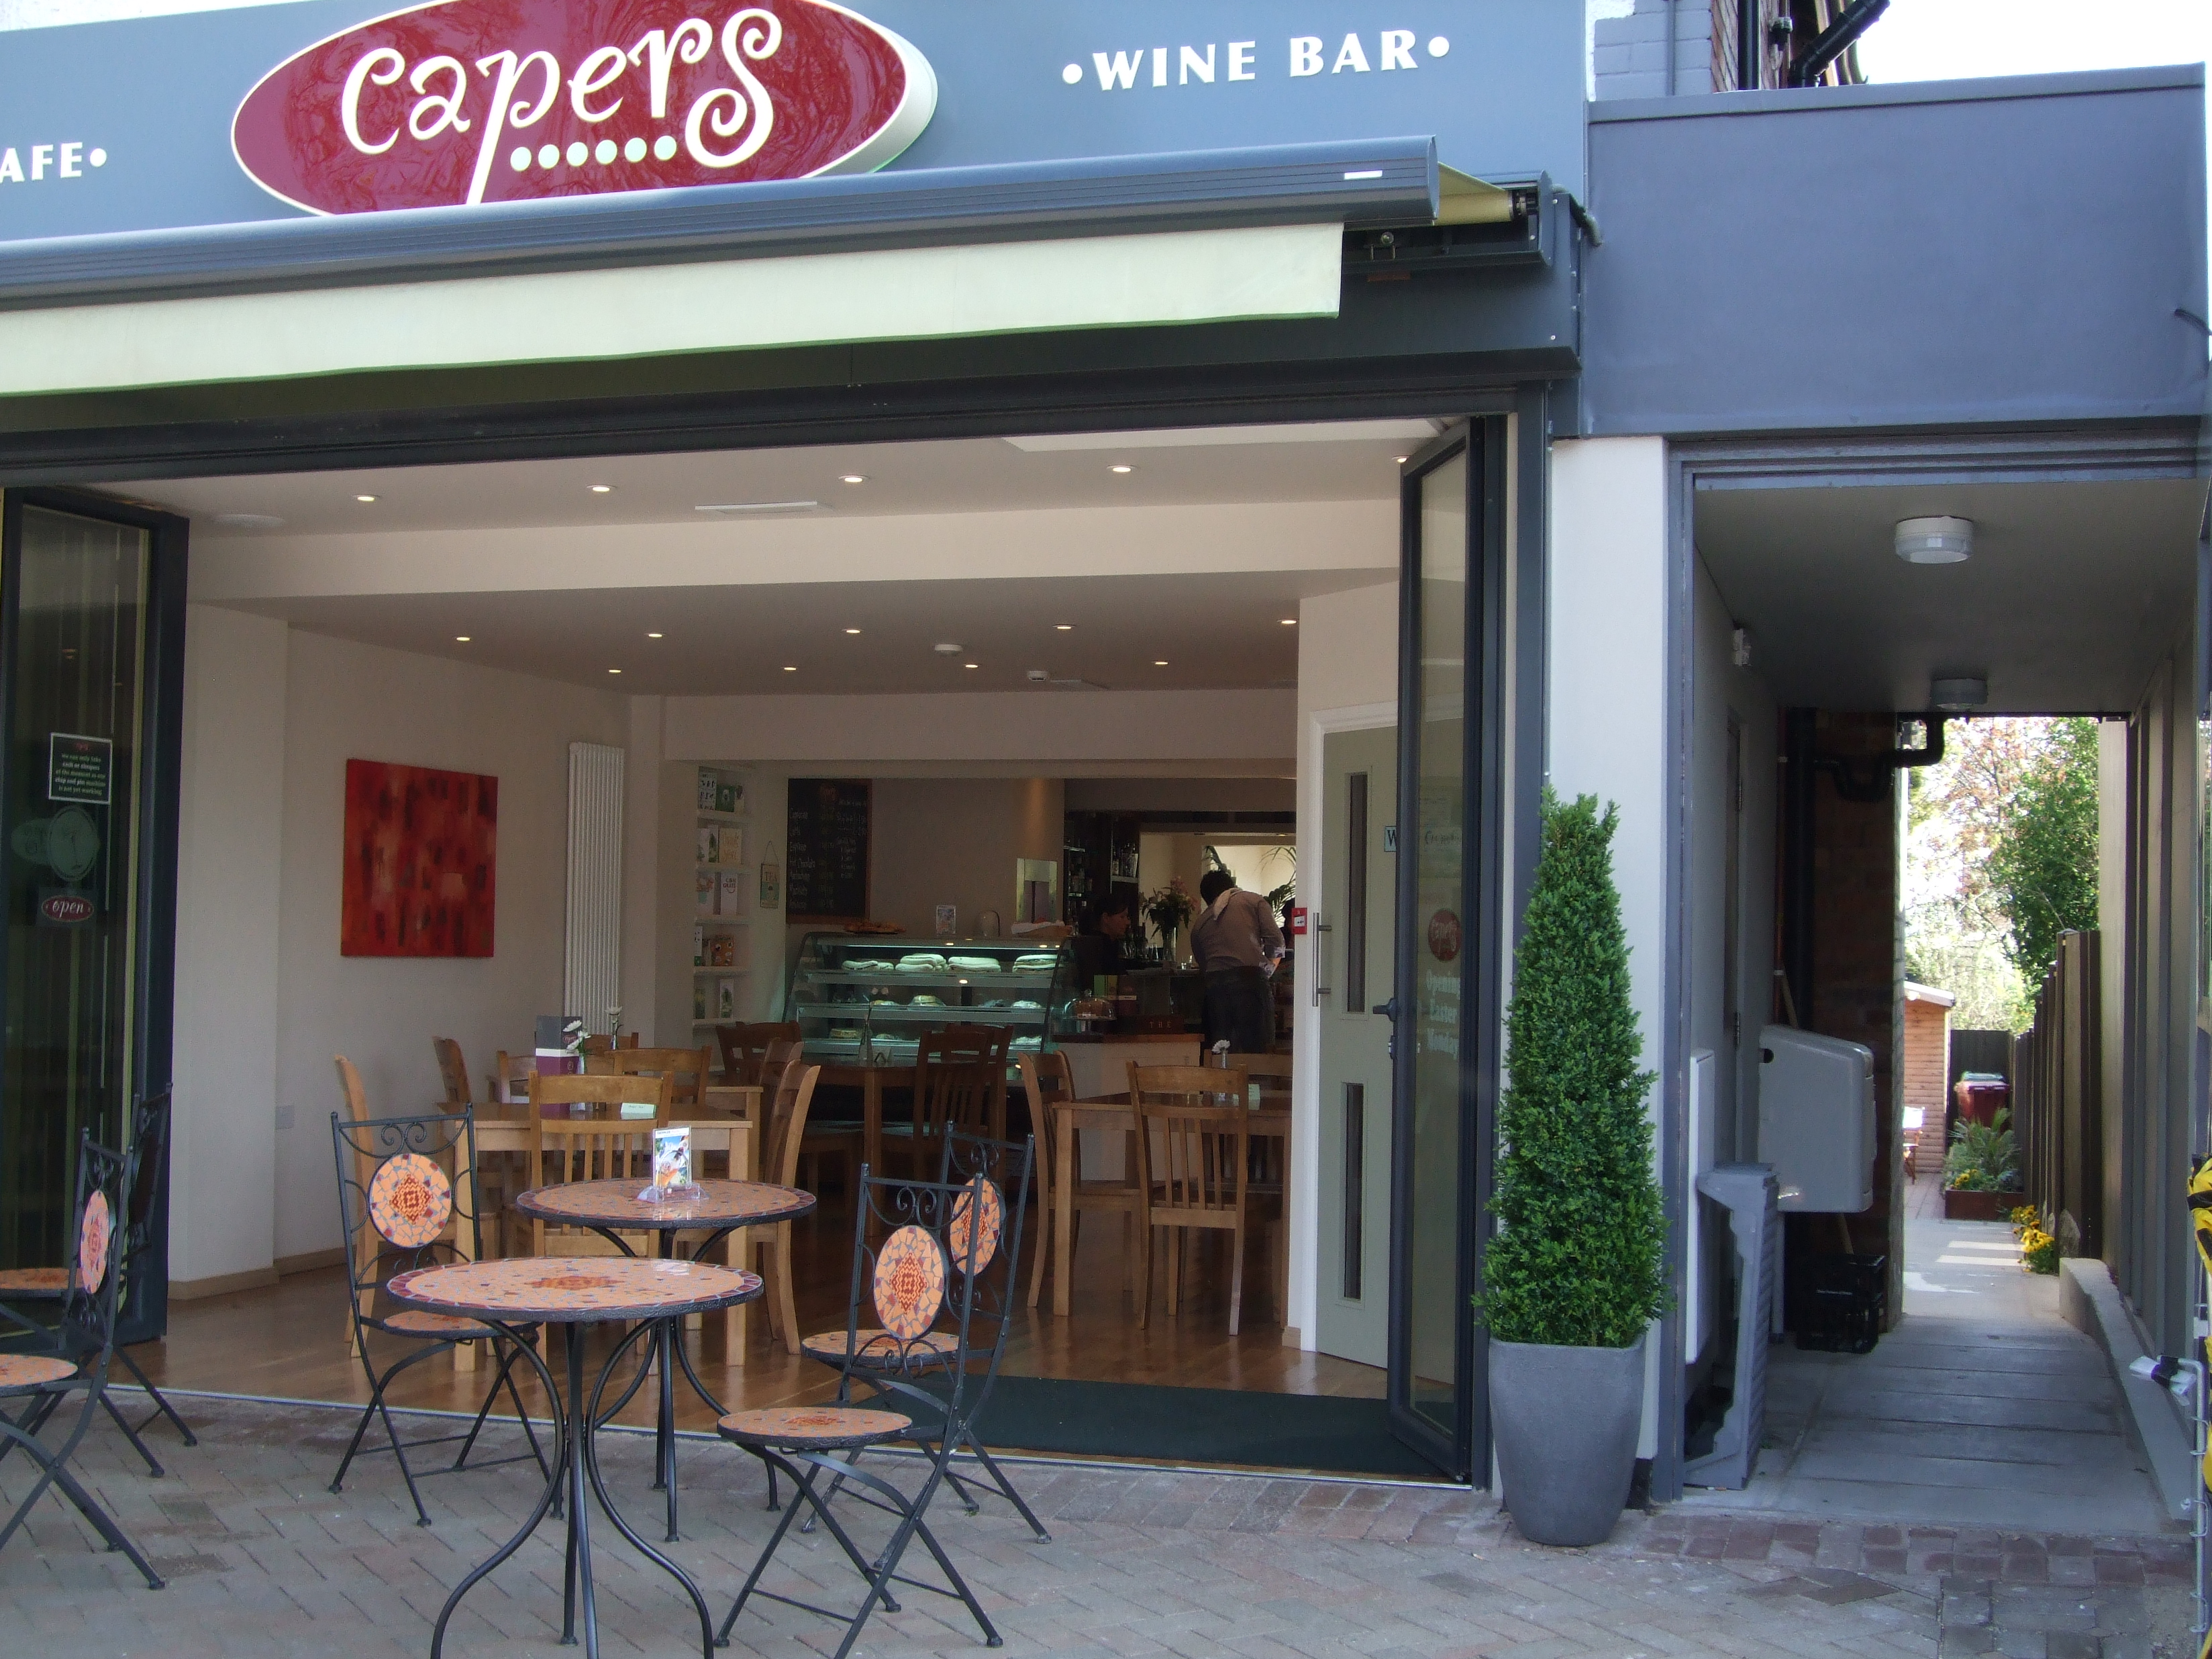 Capers Café and Restaurant